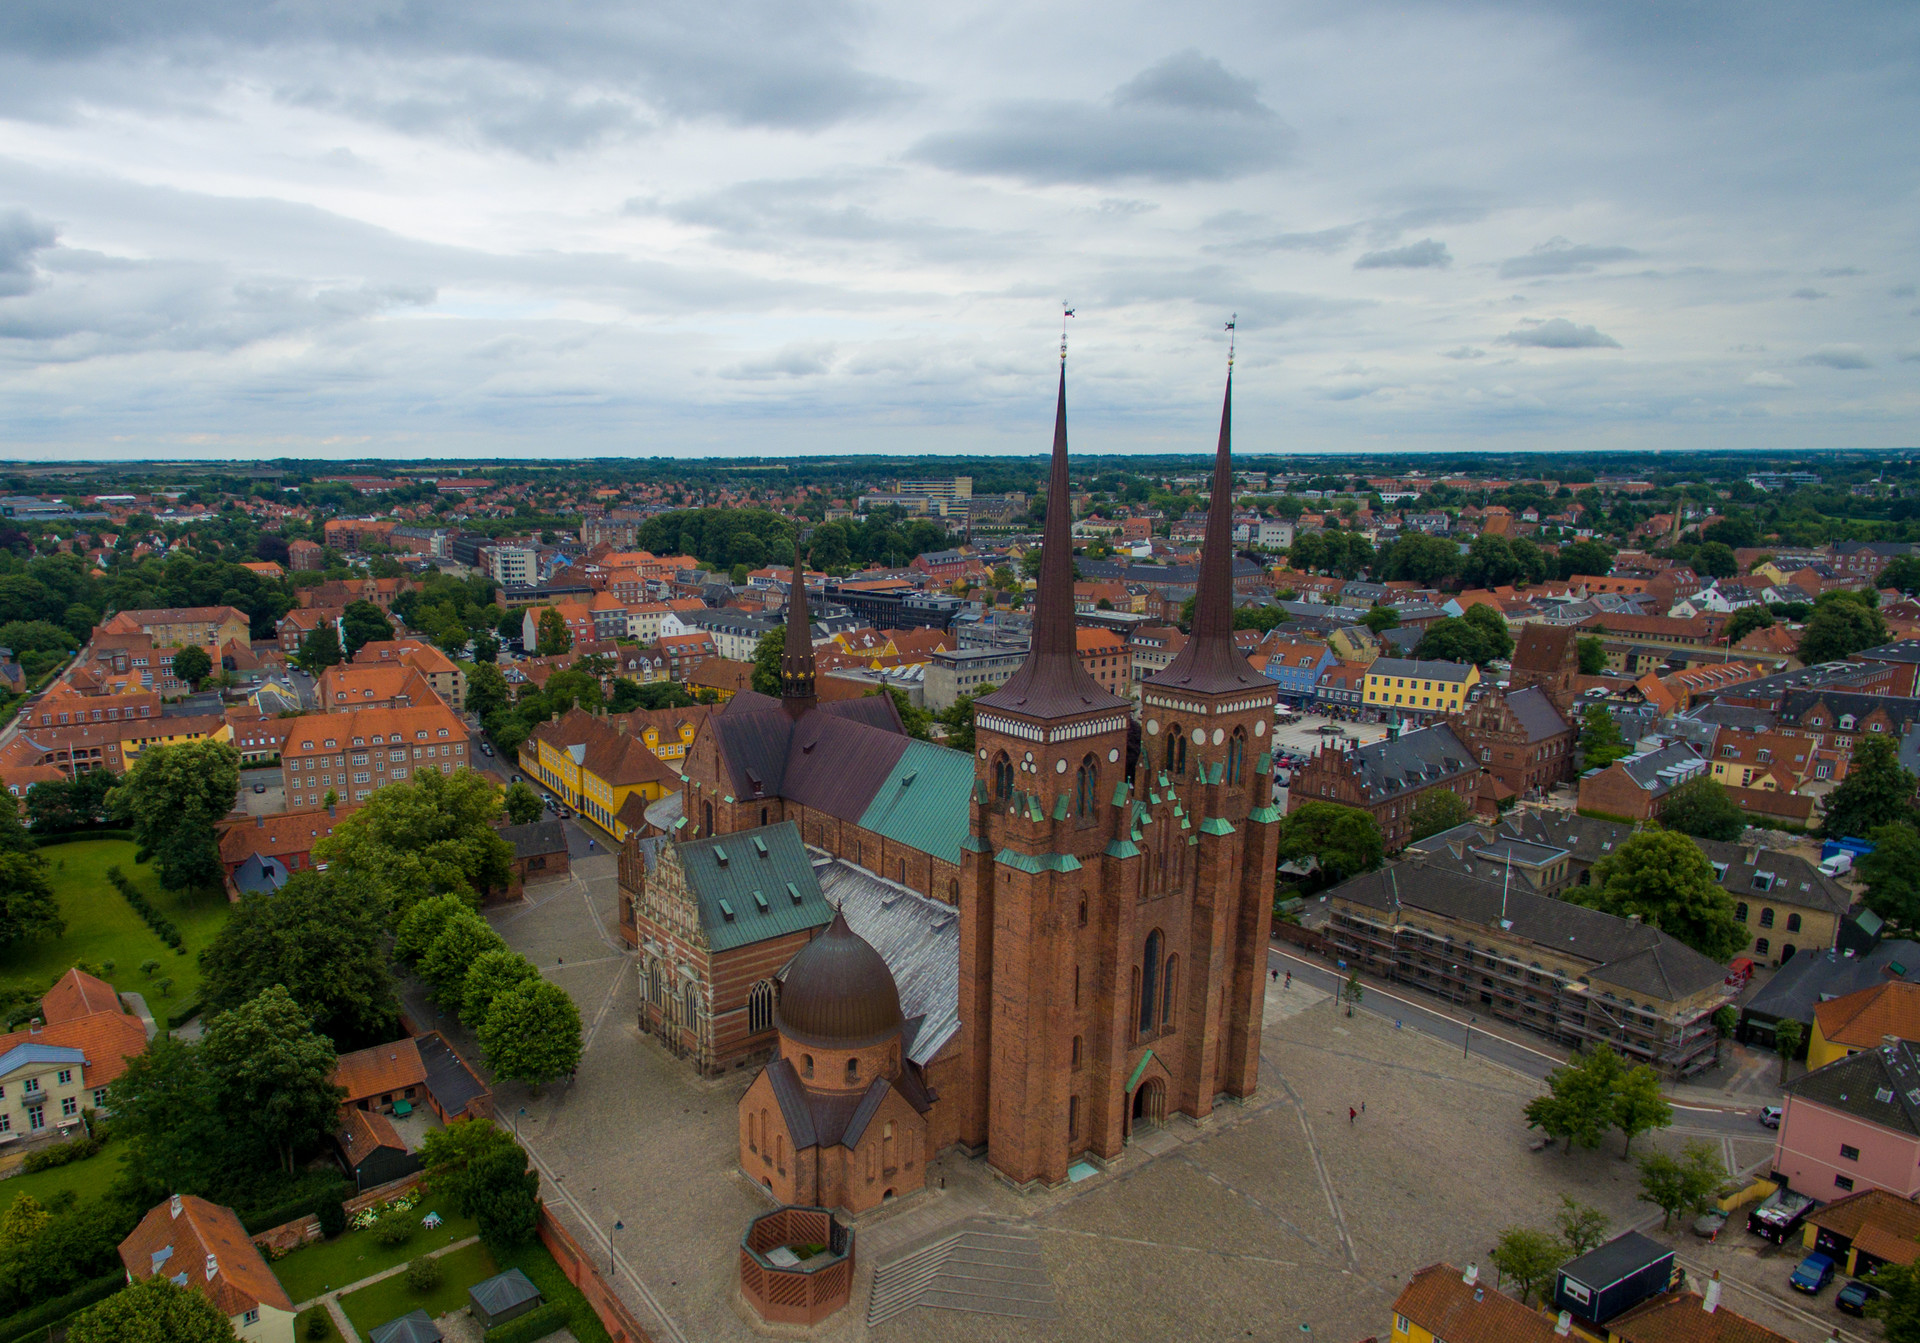 L'expérience Erasmus à Roskilde, Danemark par Aysegül